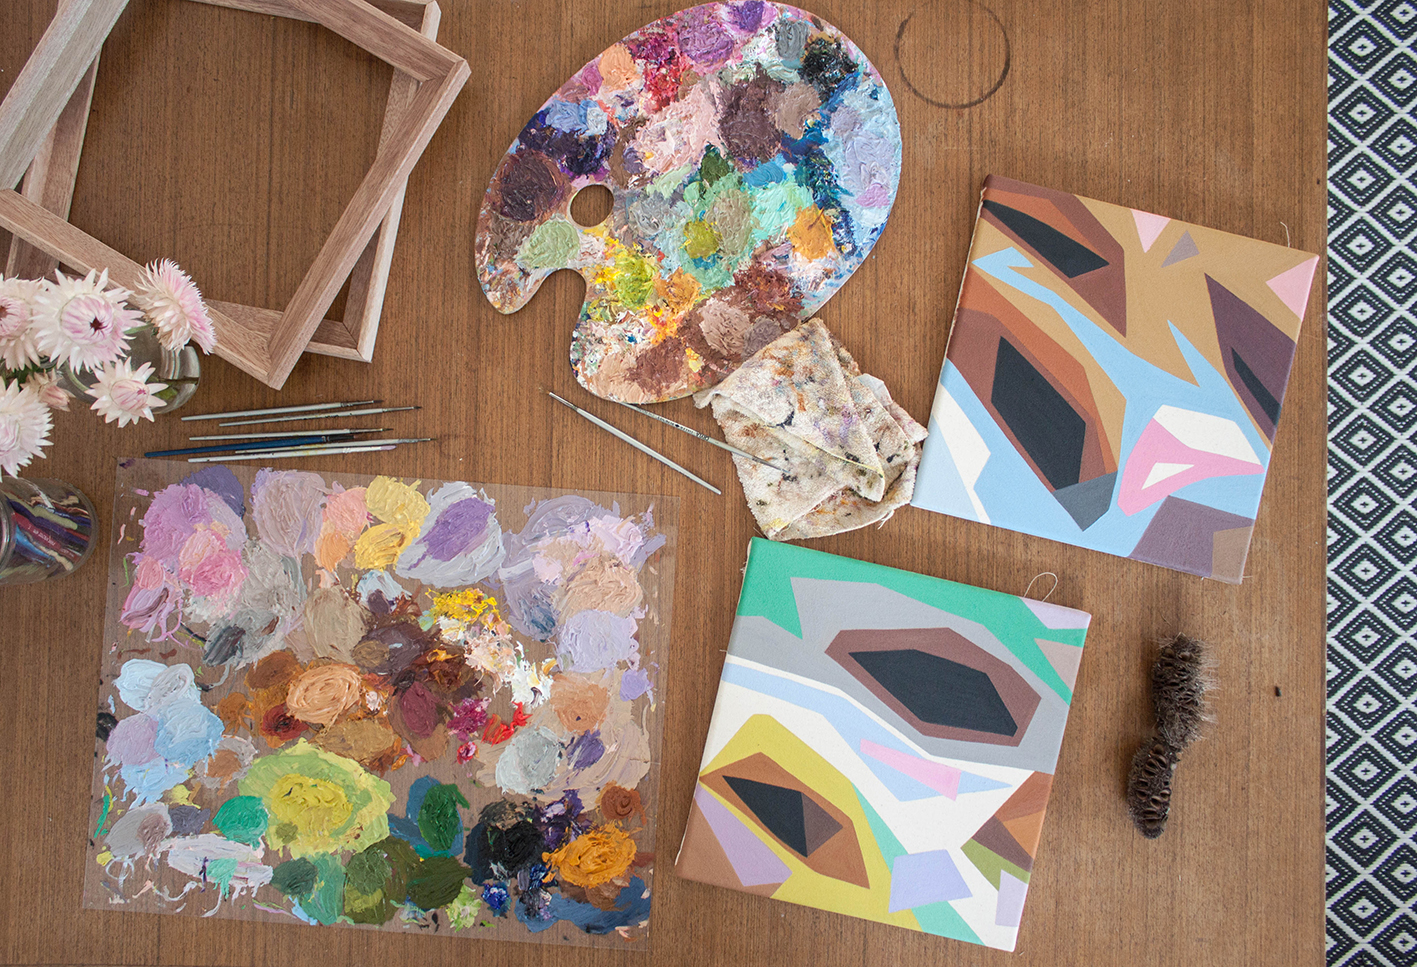 Australian artist Madeline Young studio visit - The Corner Store Gallery